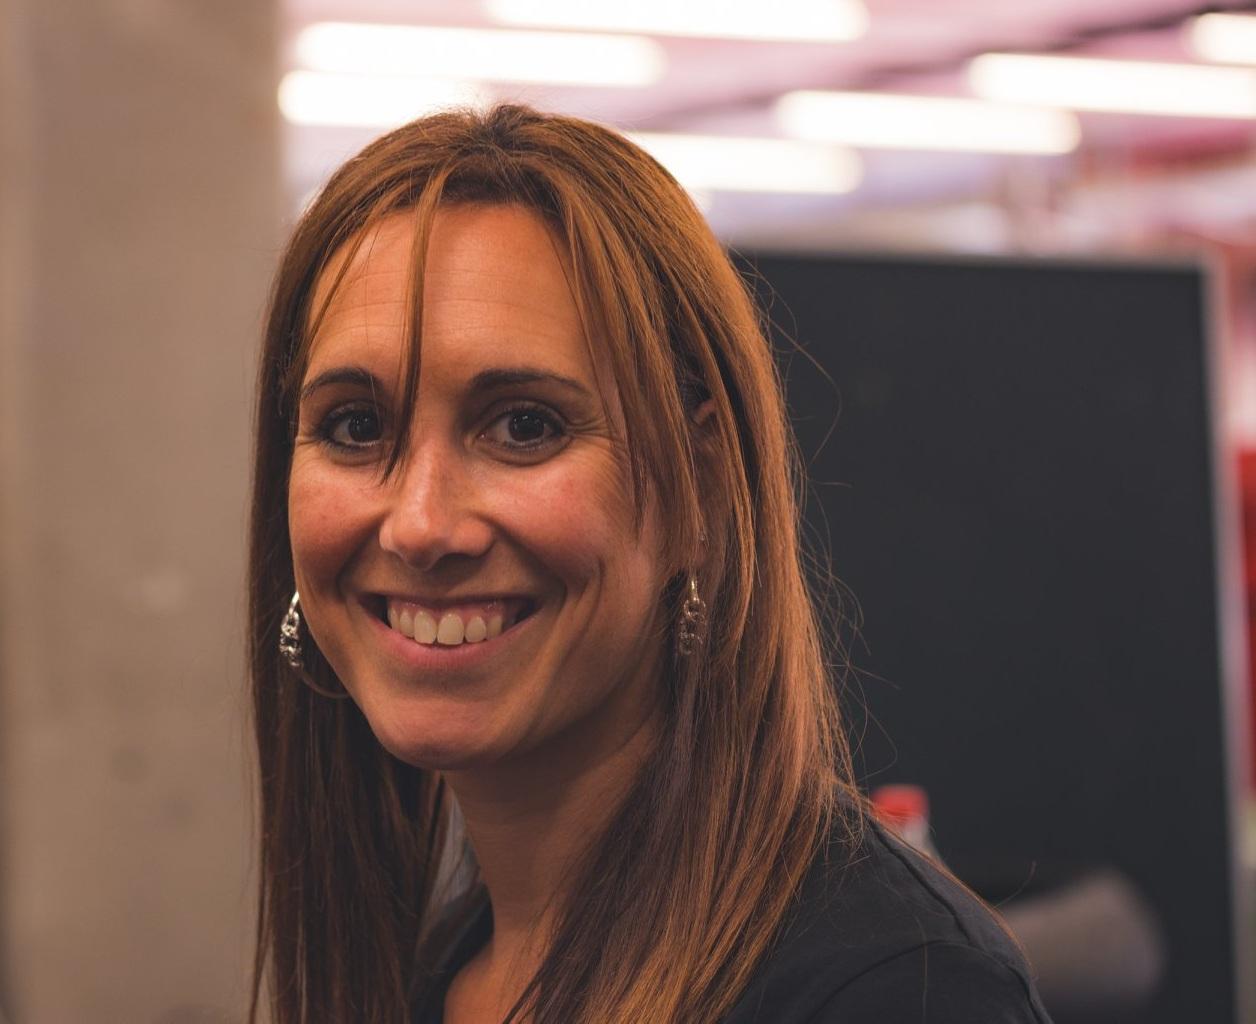 Priscillia Romanelli